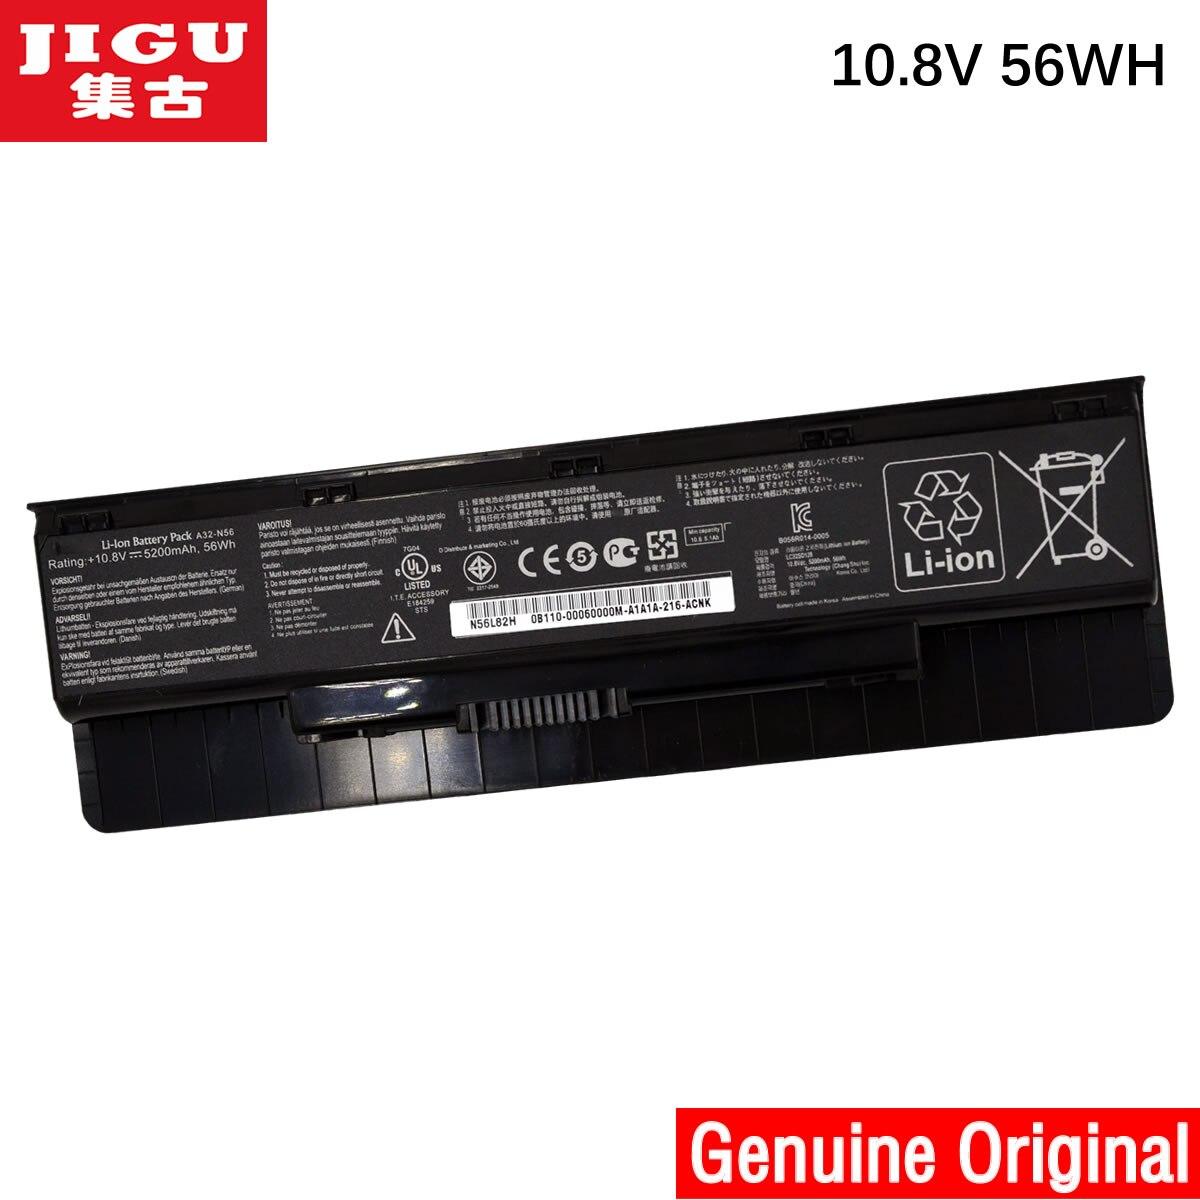 JIGU laptop battery FOR ASUS N56DP N56L82H N56V N56VJ N56VM N56VV N56VZ N76 N76V N76VJ N76VM N76VZ russian laptop keyboard for asus n56 n56v n76 n76v n76vb n76vj n76vm n76vz u500vz n56vv n56vz u500vz u500 u500v silver backlight